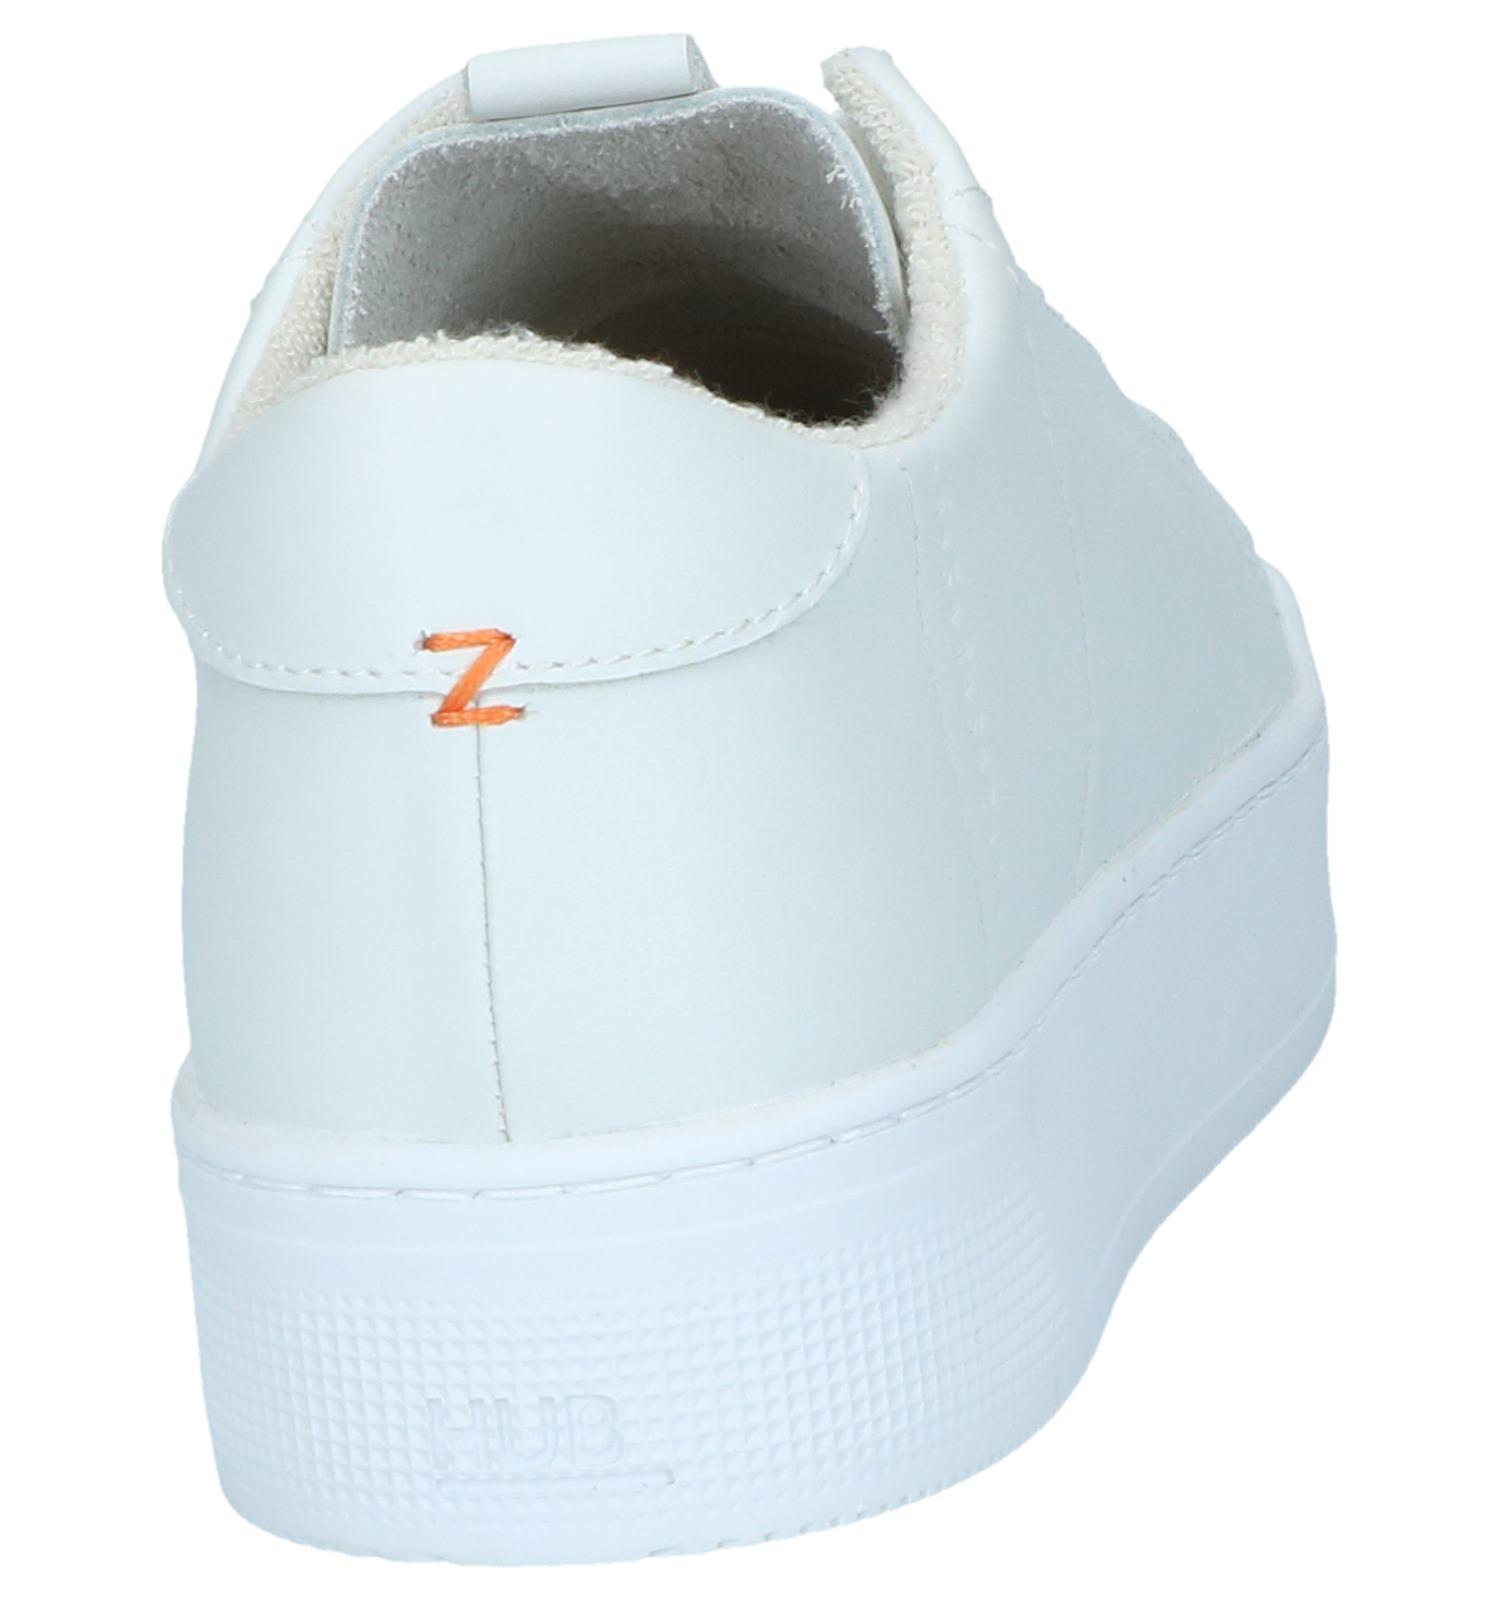 Verzend Gratis Xl be Hub Retour Torfs En Hook Sneakers Witte 7nU6wqSPx